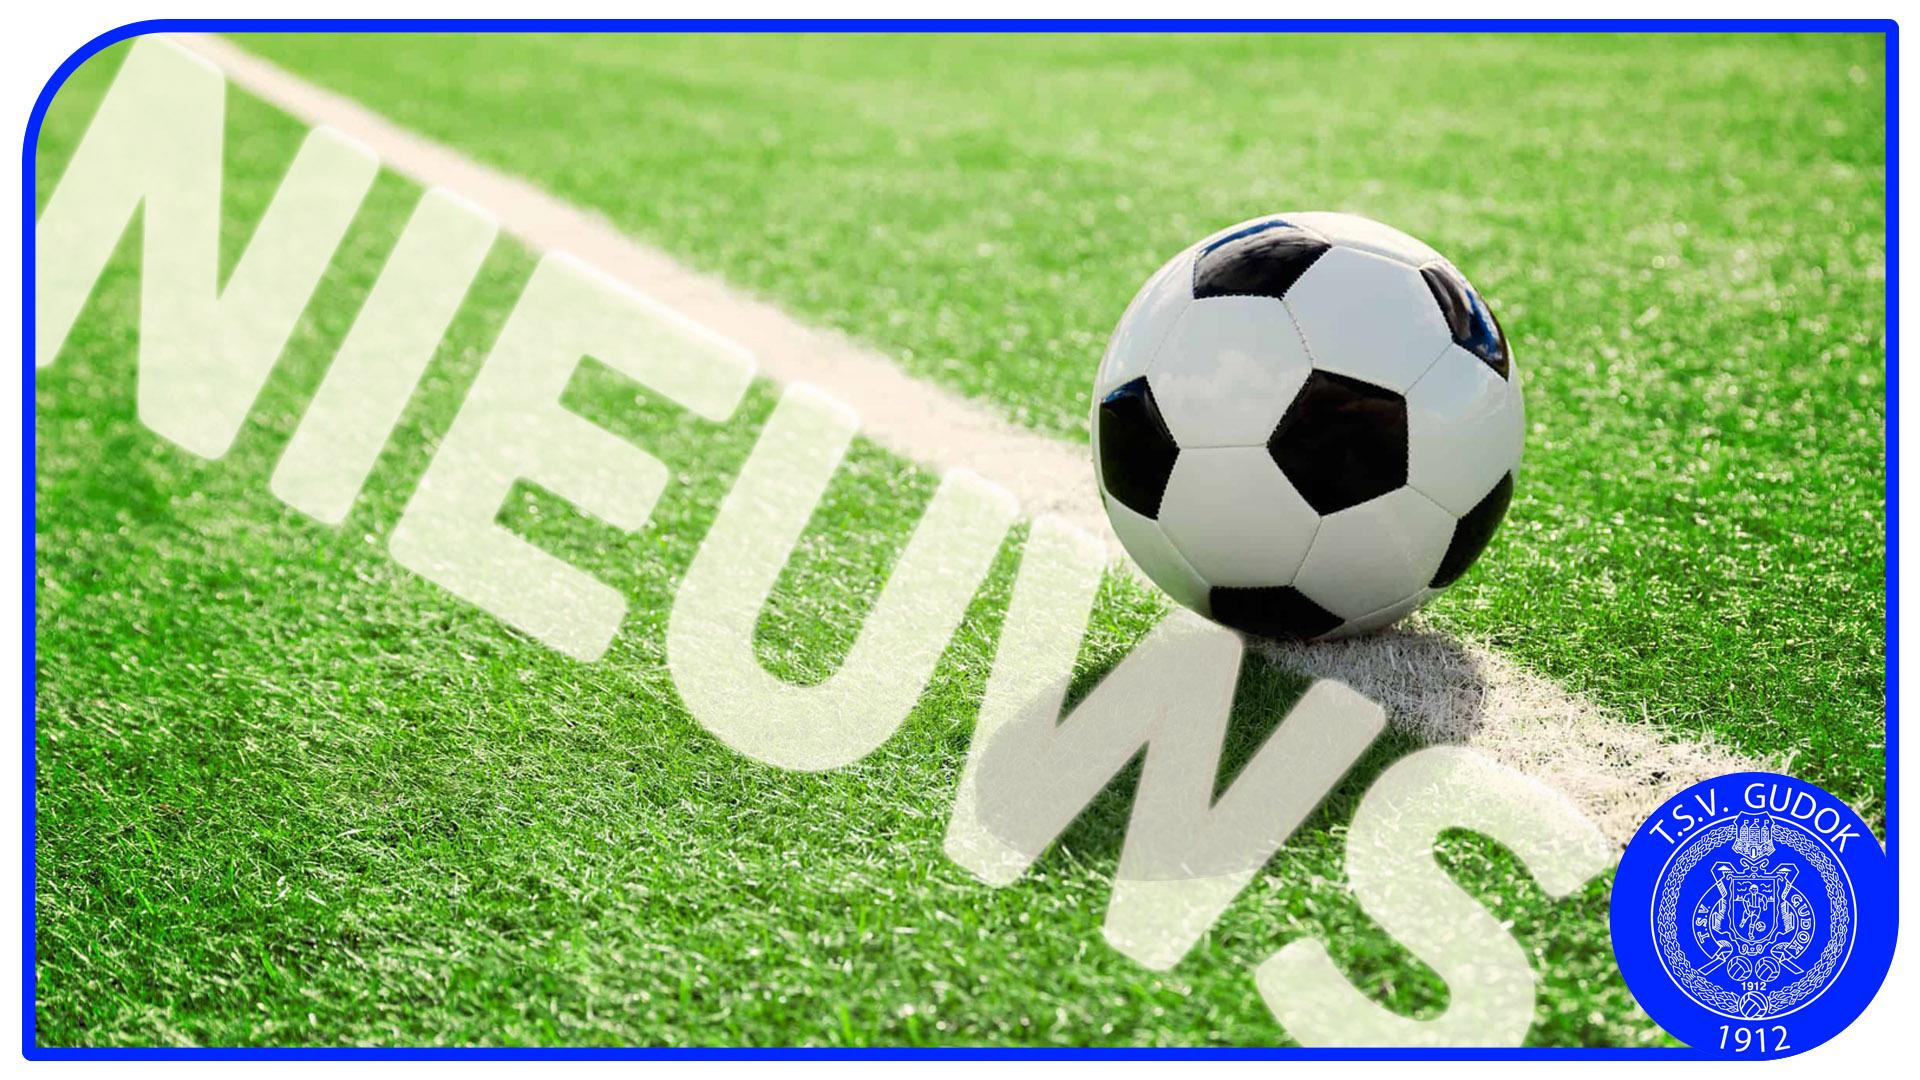 Tegemoetkoming contributie seniorleden seizoen 2020/2021